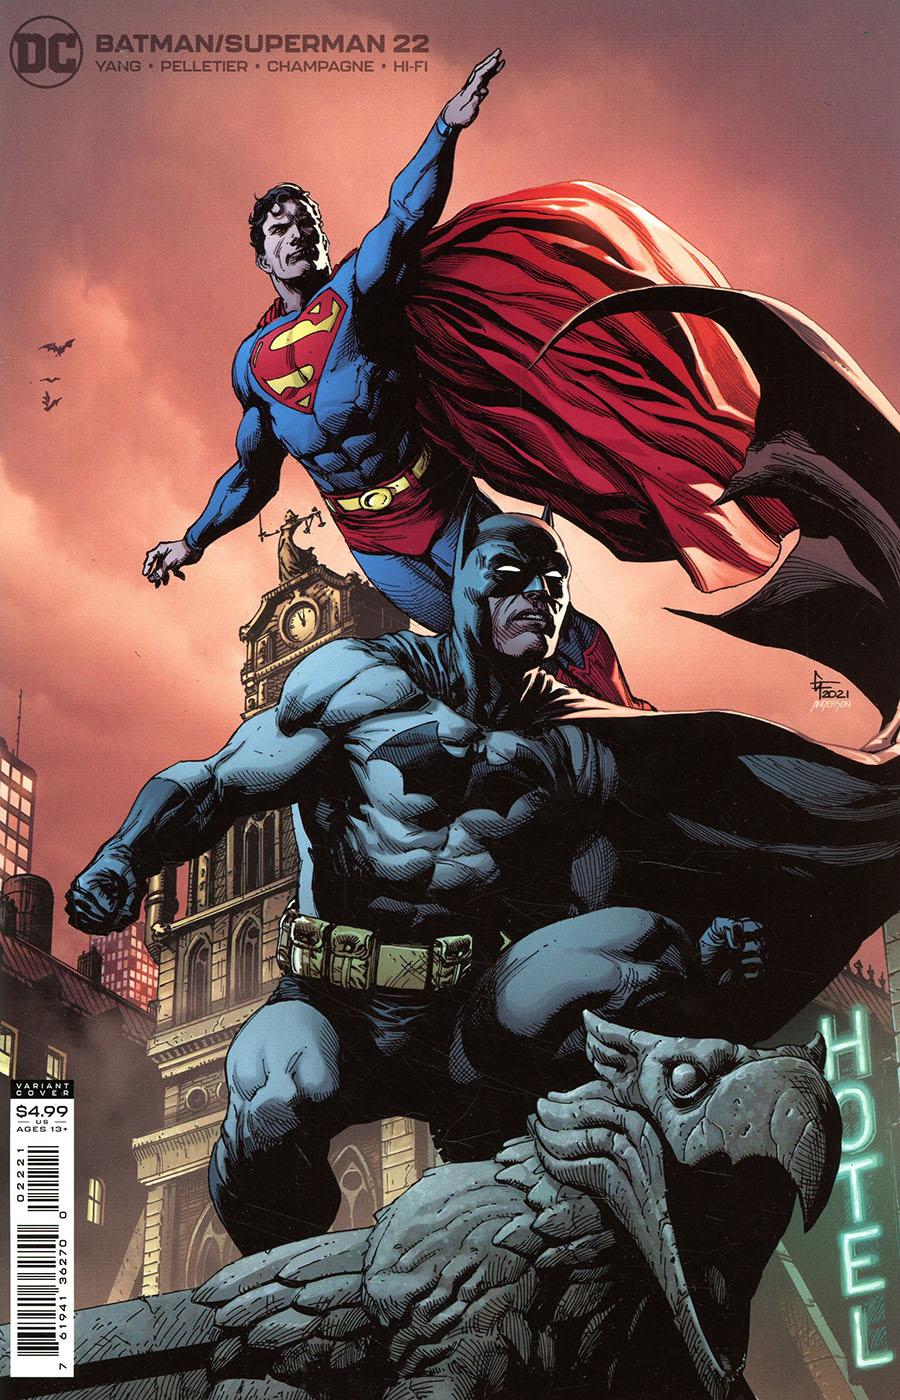 Batman Superman Vol 2 #22 Cover B Variant Gary Frank Card Stock Cover